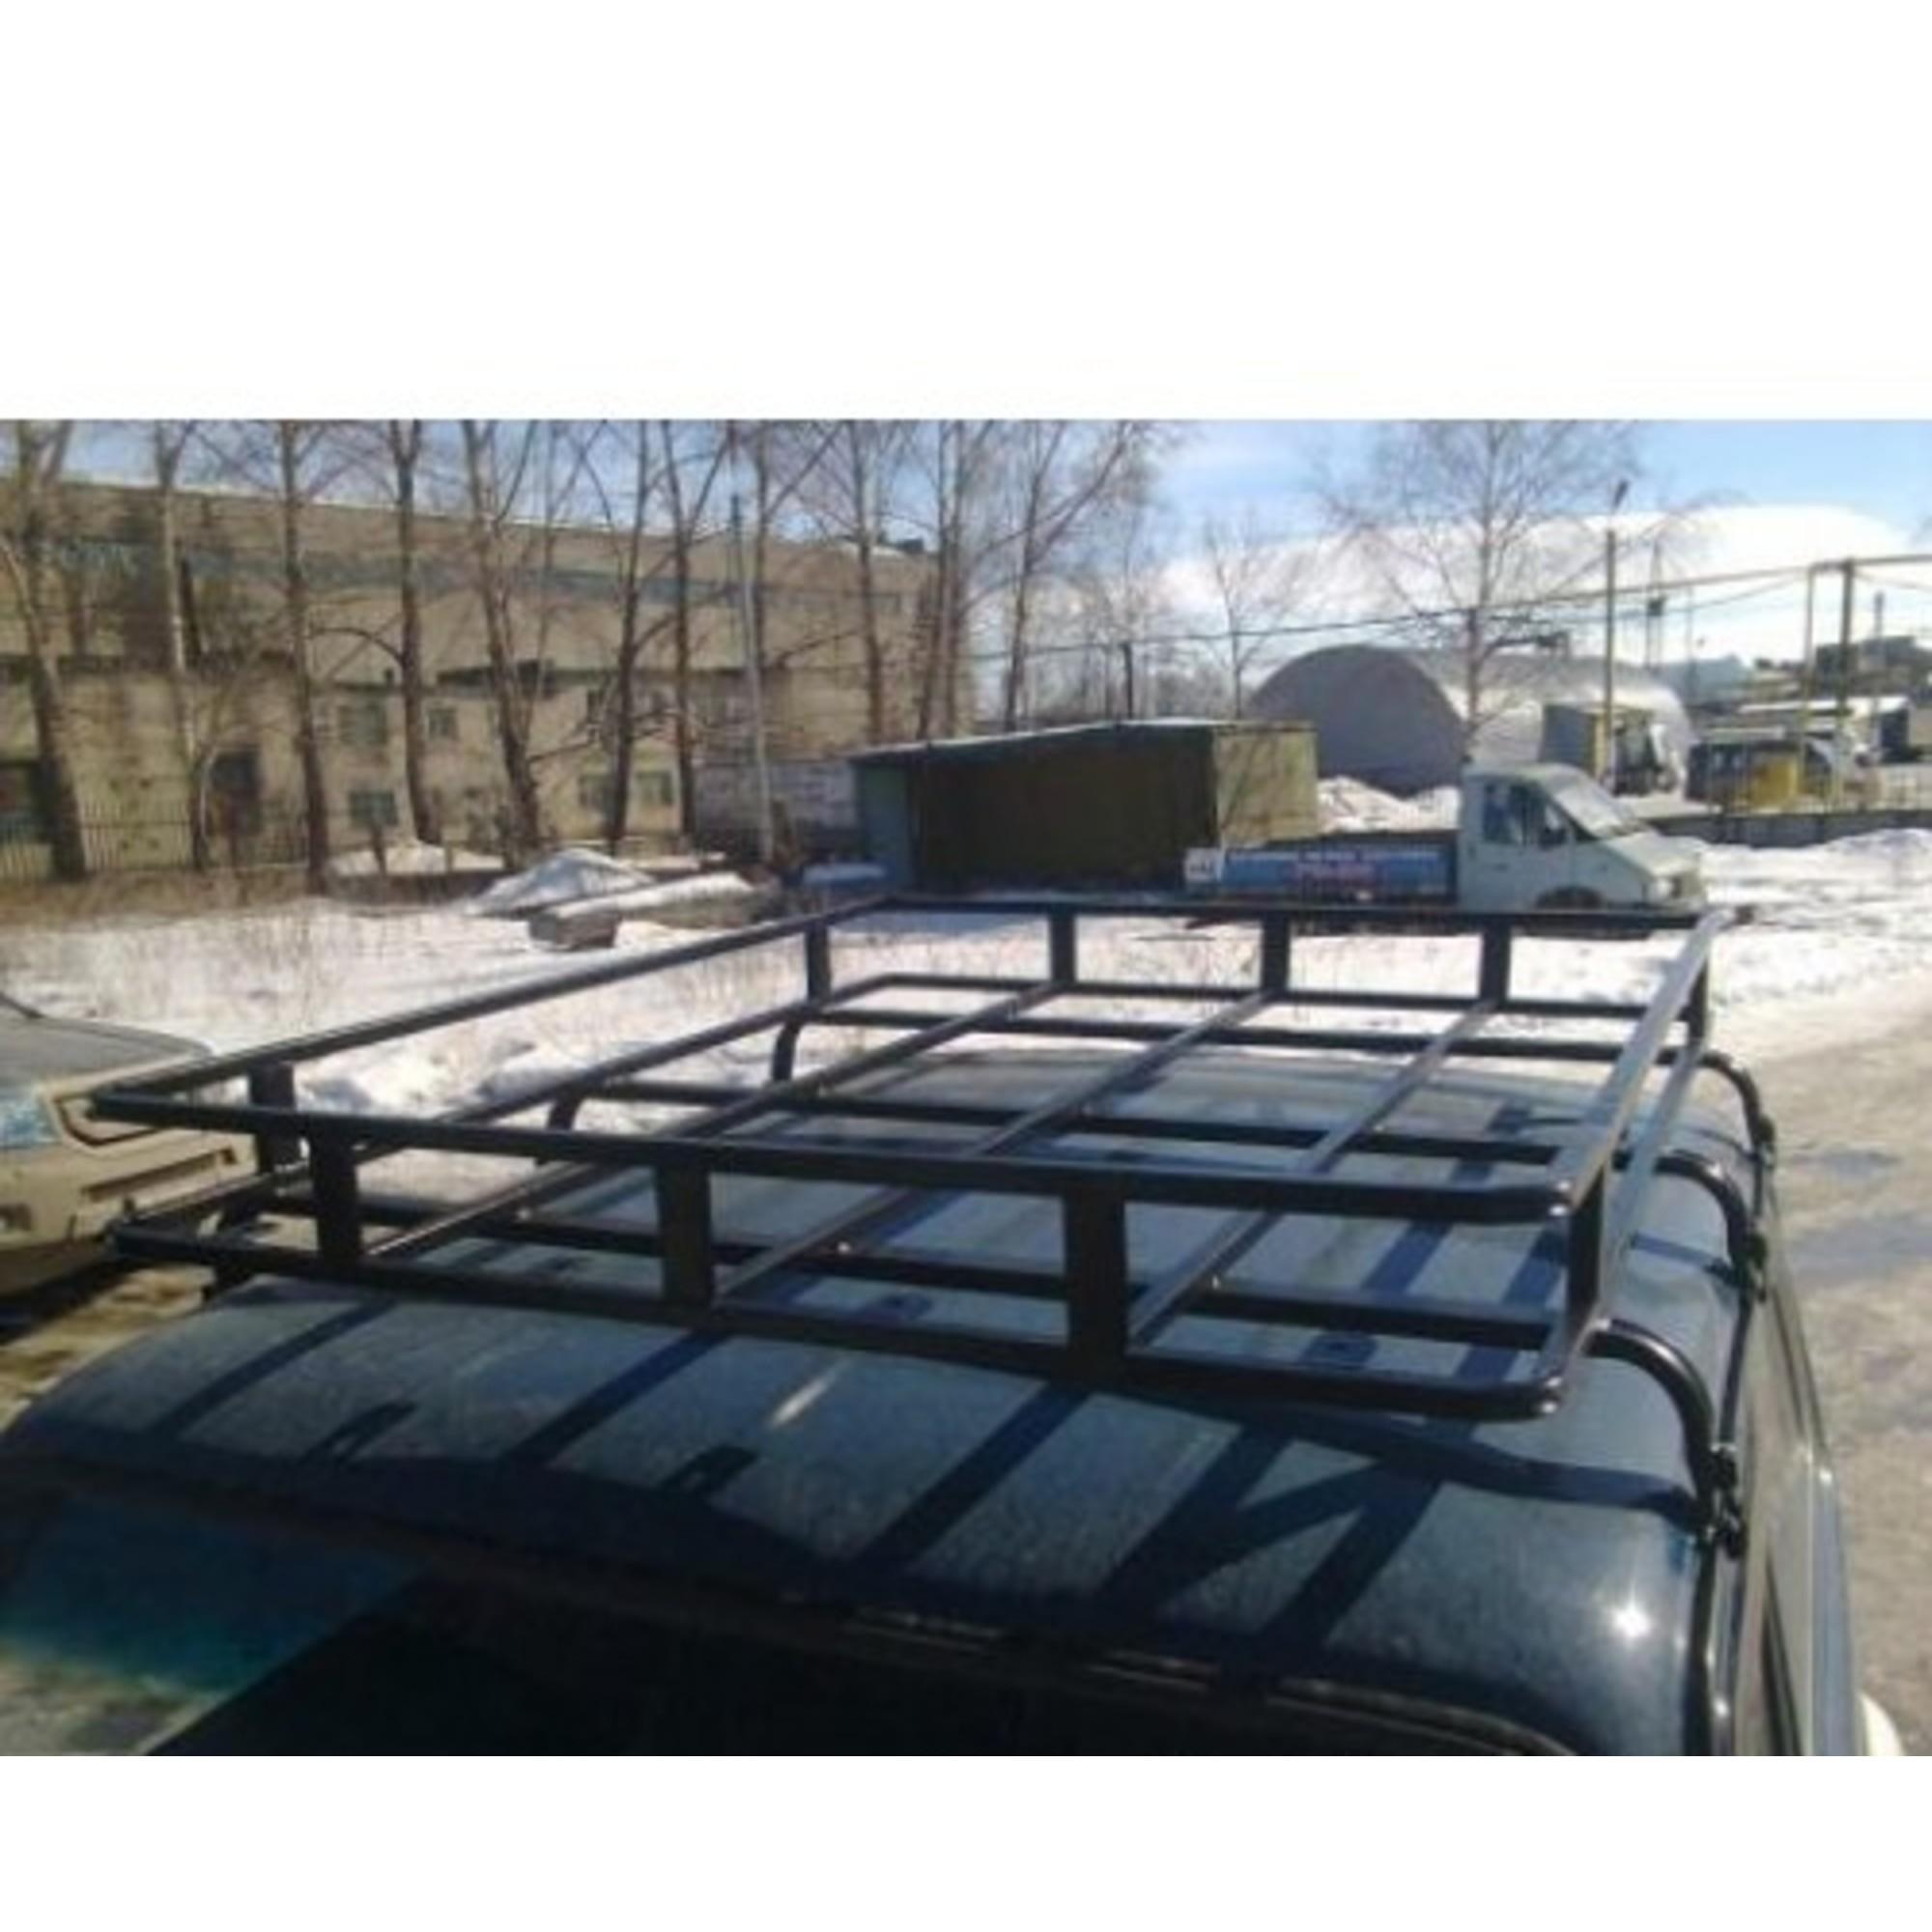 Багажник на НИВУ 2131 Корзинка 6 опор 2 м